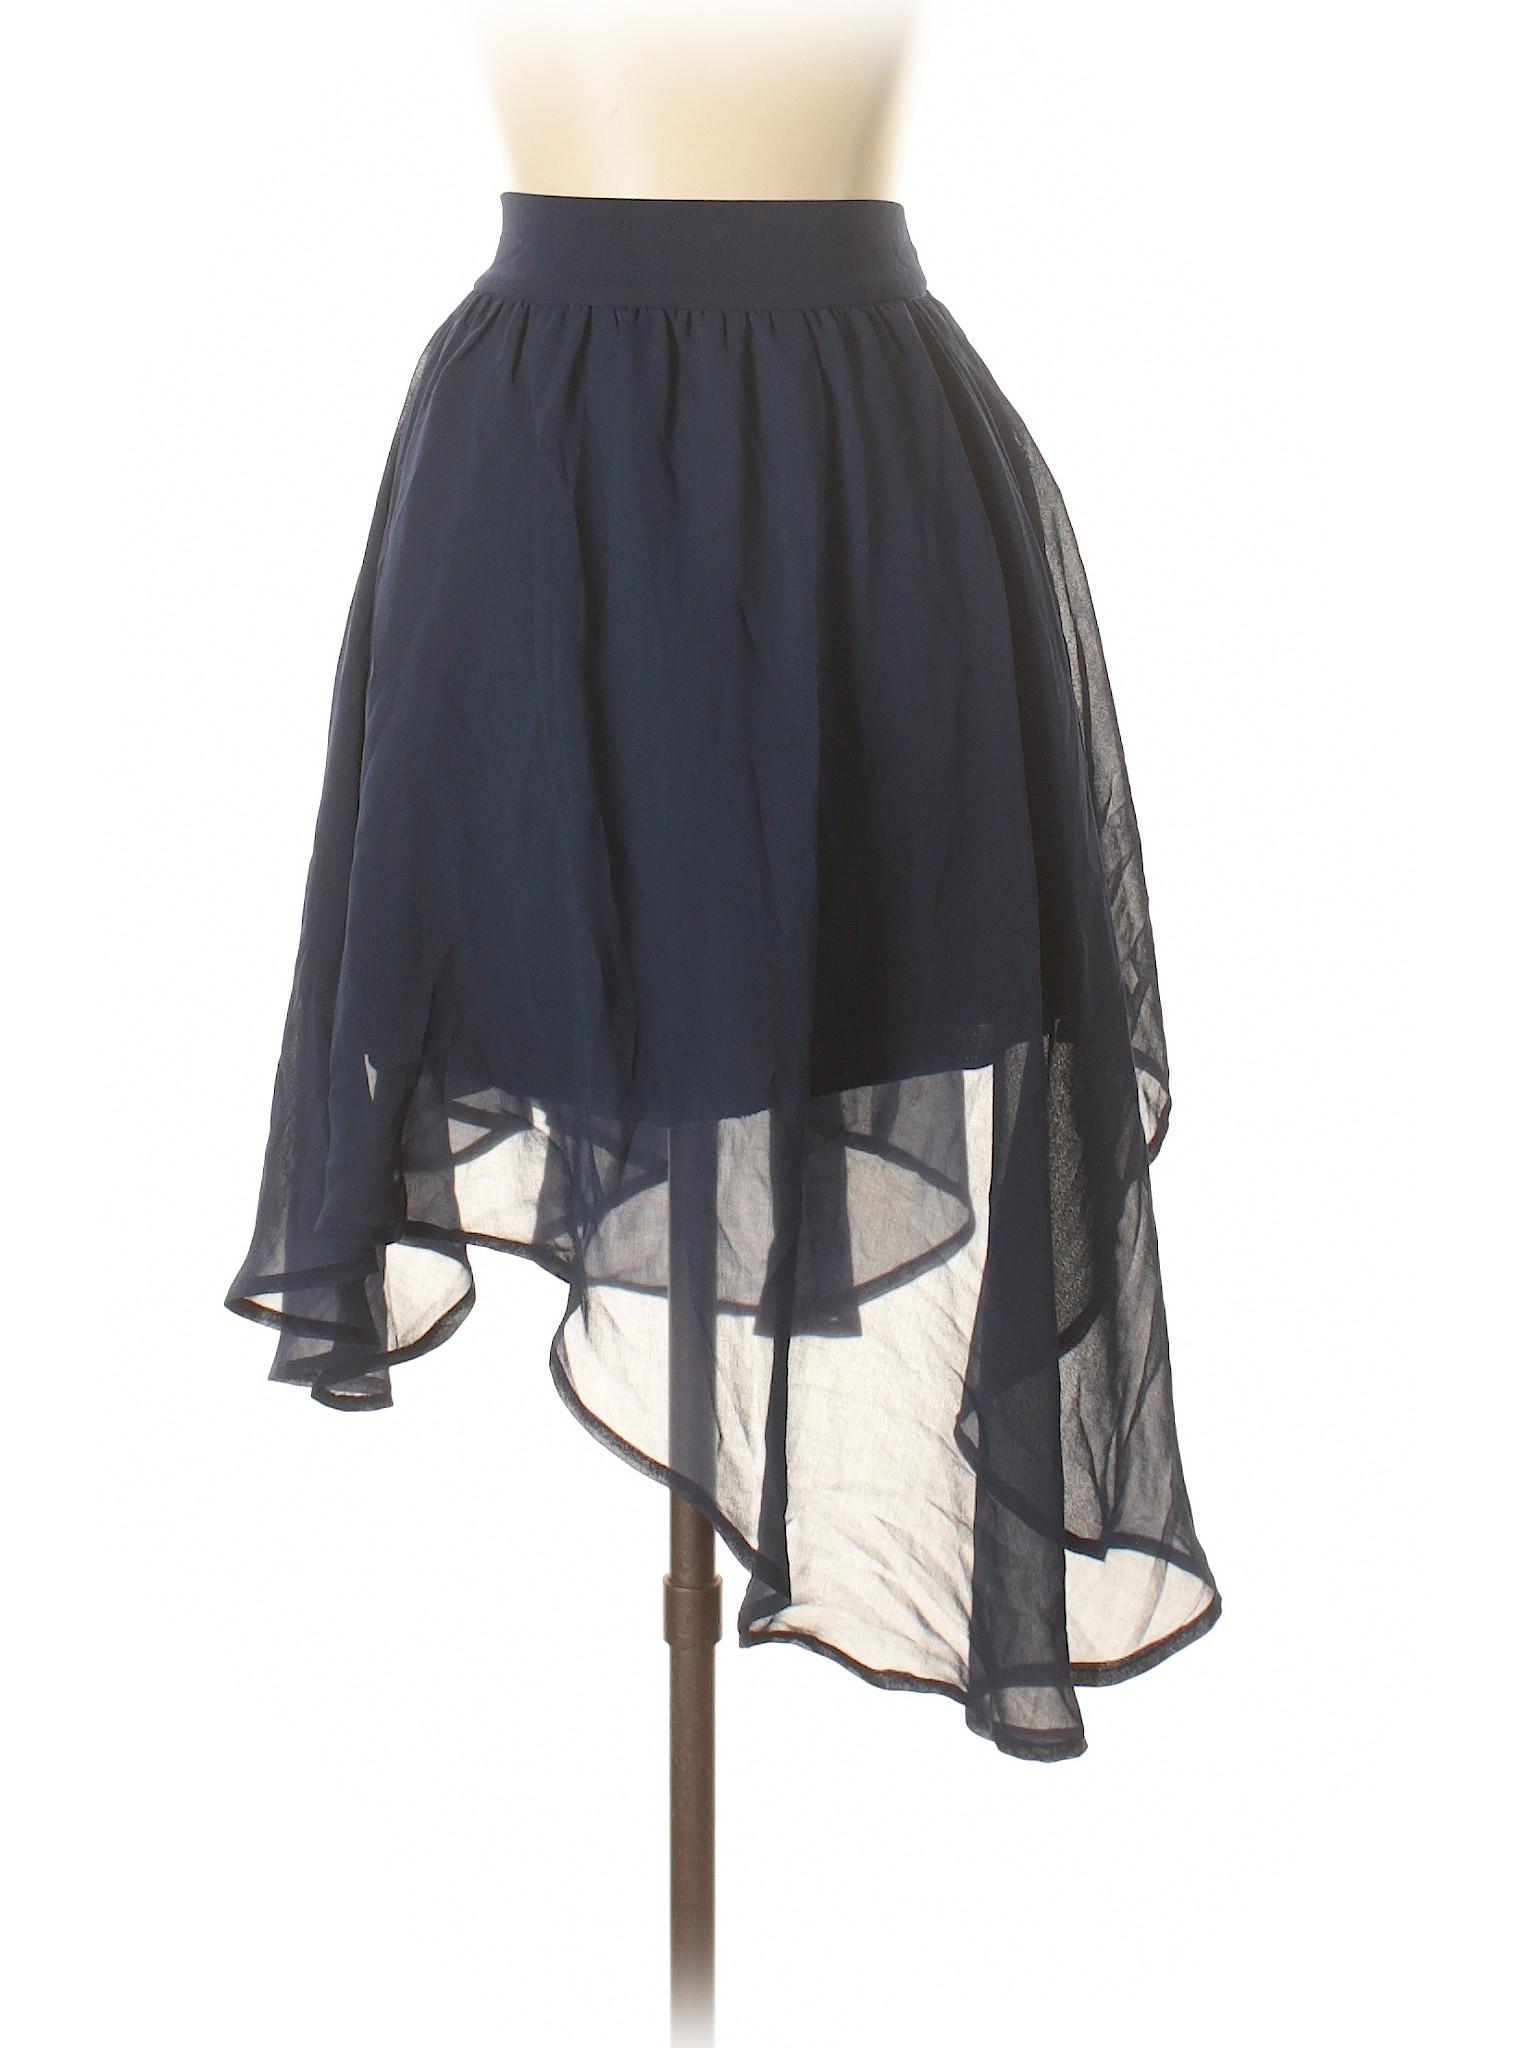 Skirt Leisure winter Verty Skirt Leisure winter Casual Verty winter Casual Leisure AxBqUA